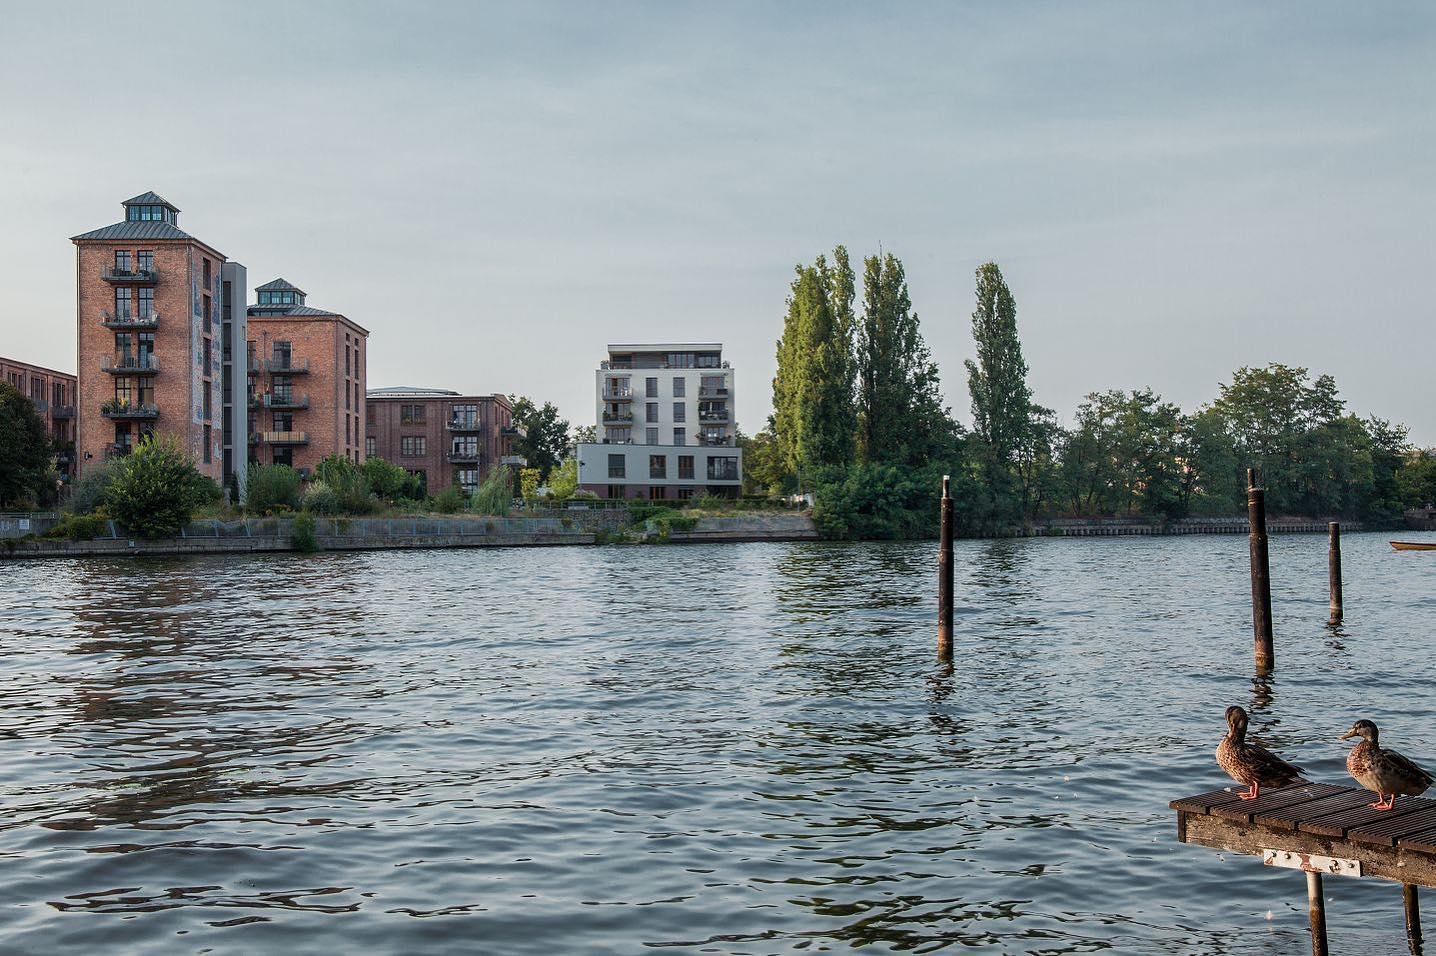 Glanzfilmfactory. . . #architecturephotography #architecture #archidaily #architektur #archilovers #architecturedaily #architecture_hunter #berlinarchitecture #köpenick